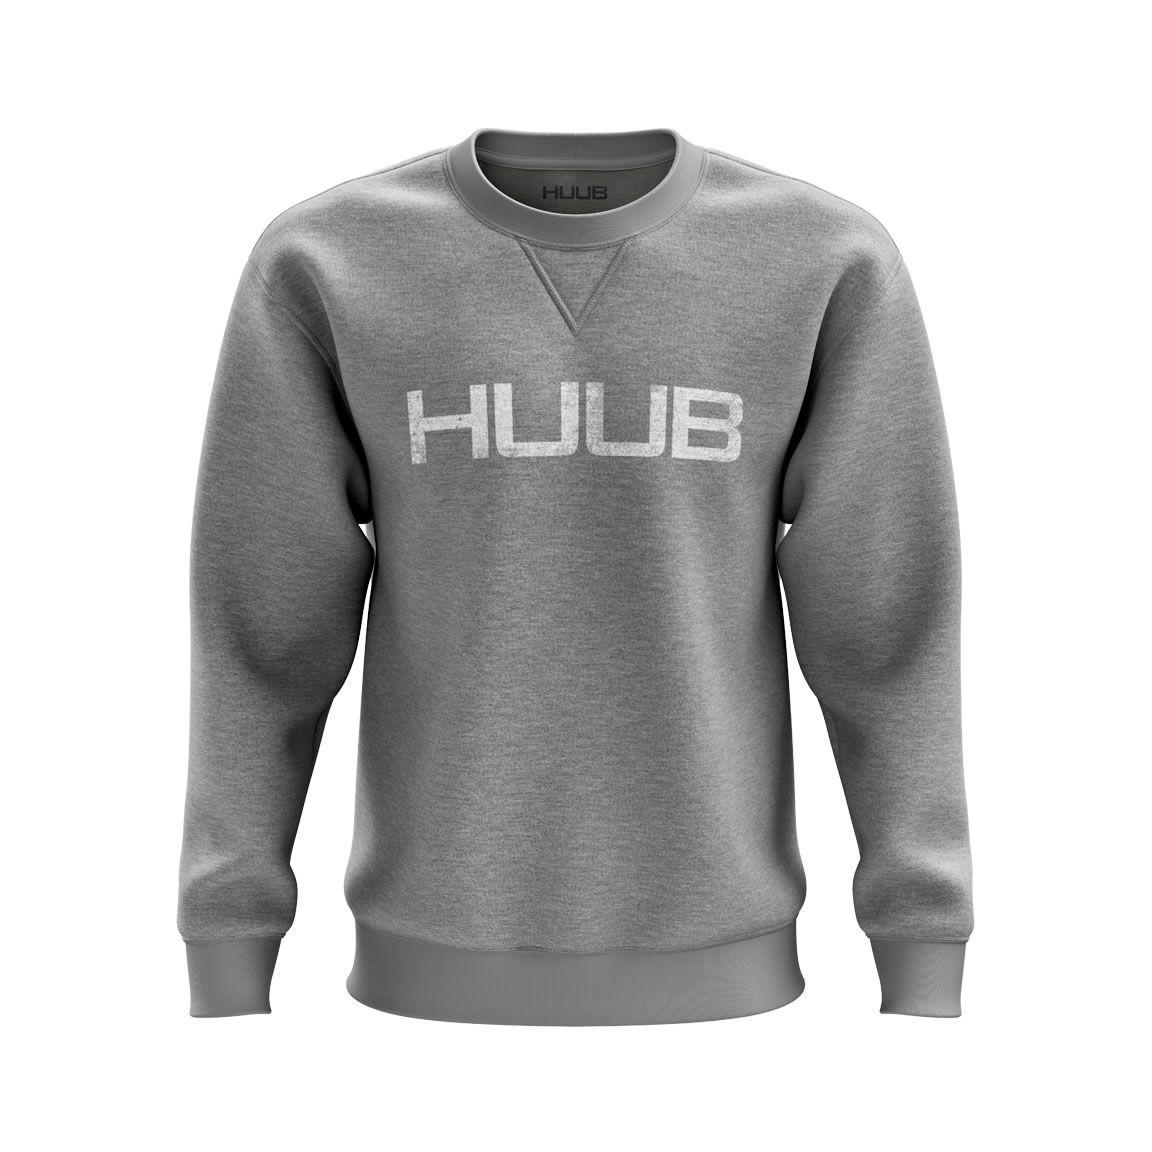 HUUB Casual Sweatshirt Herren